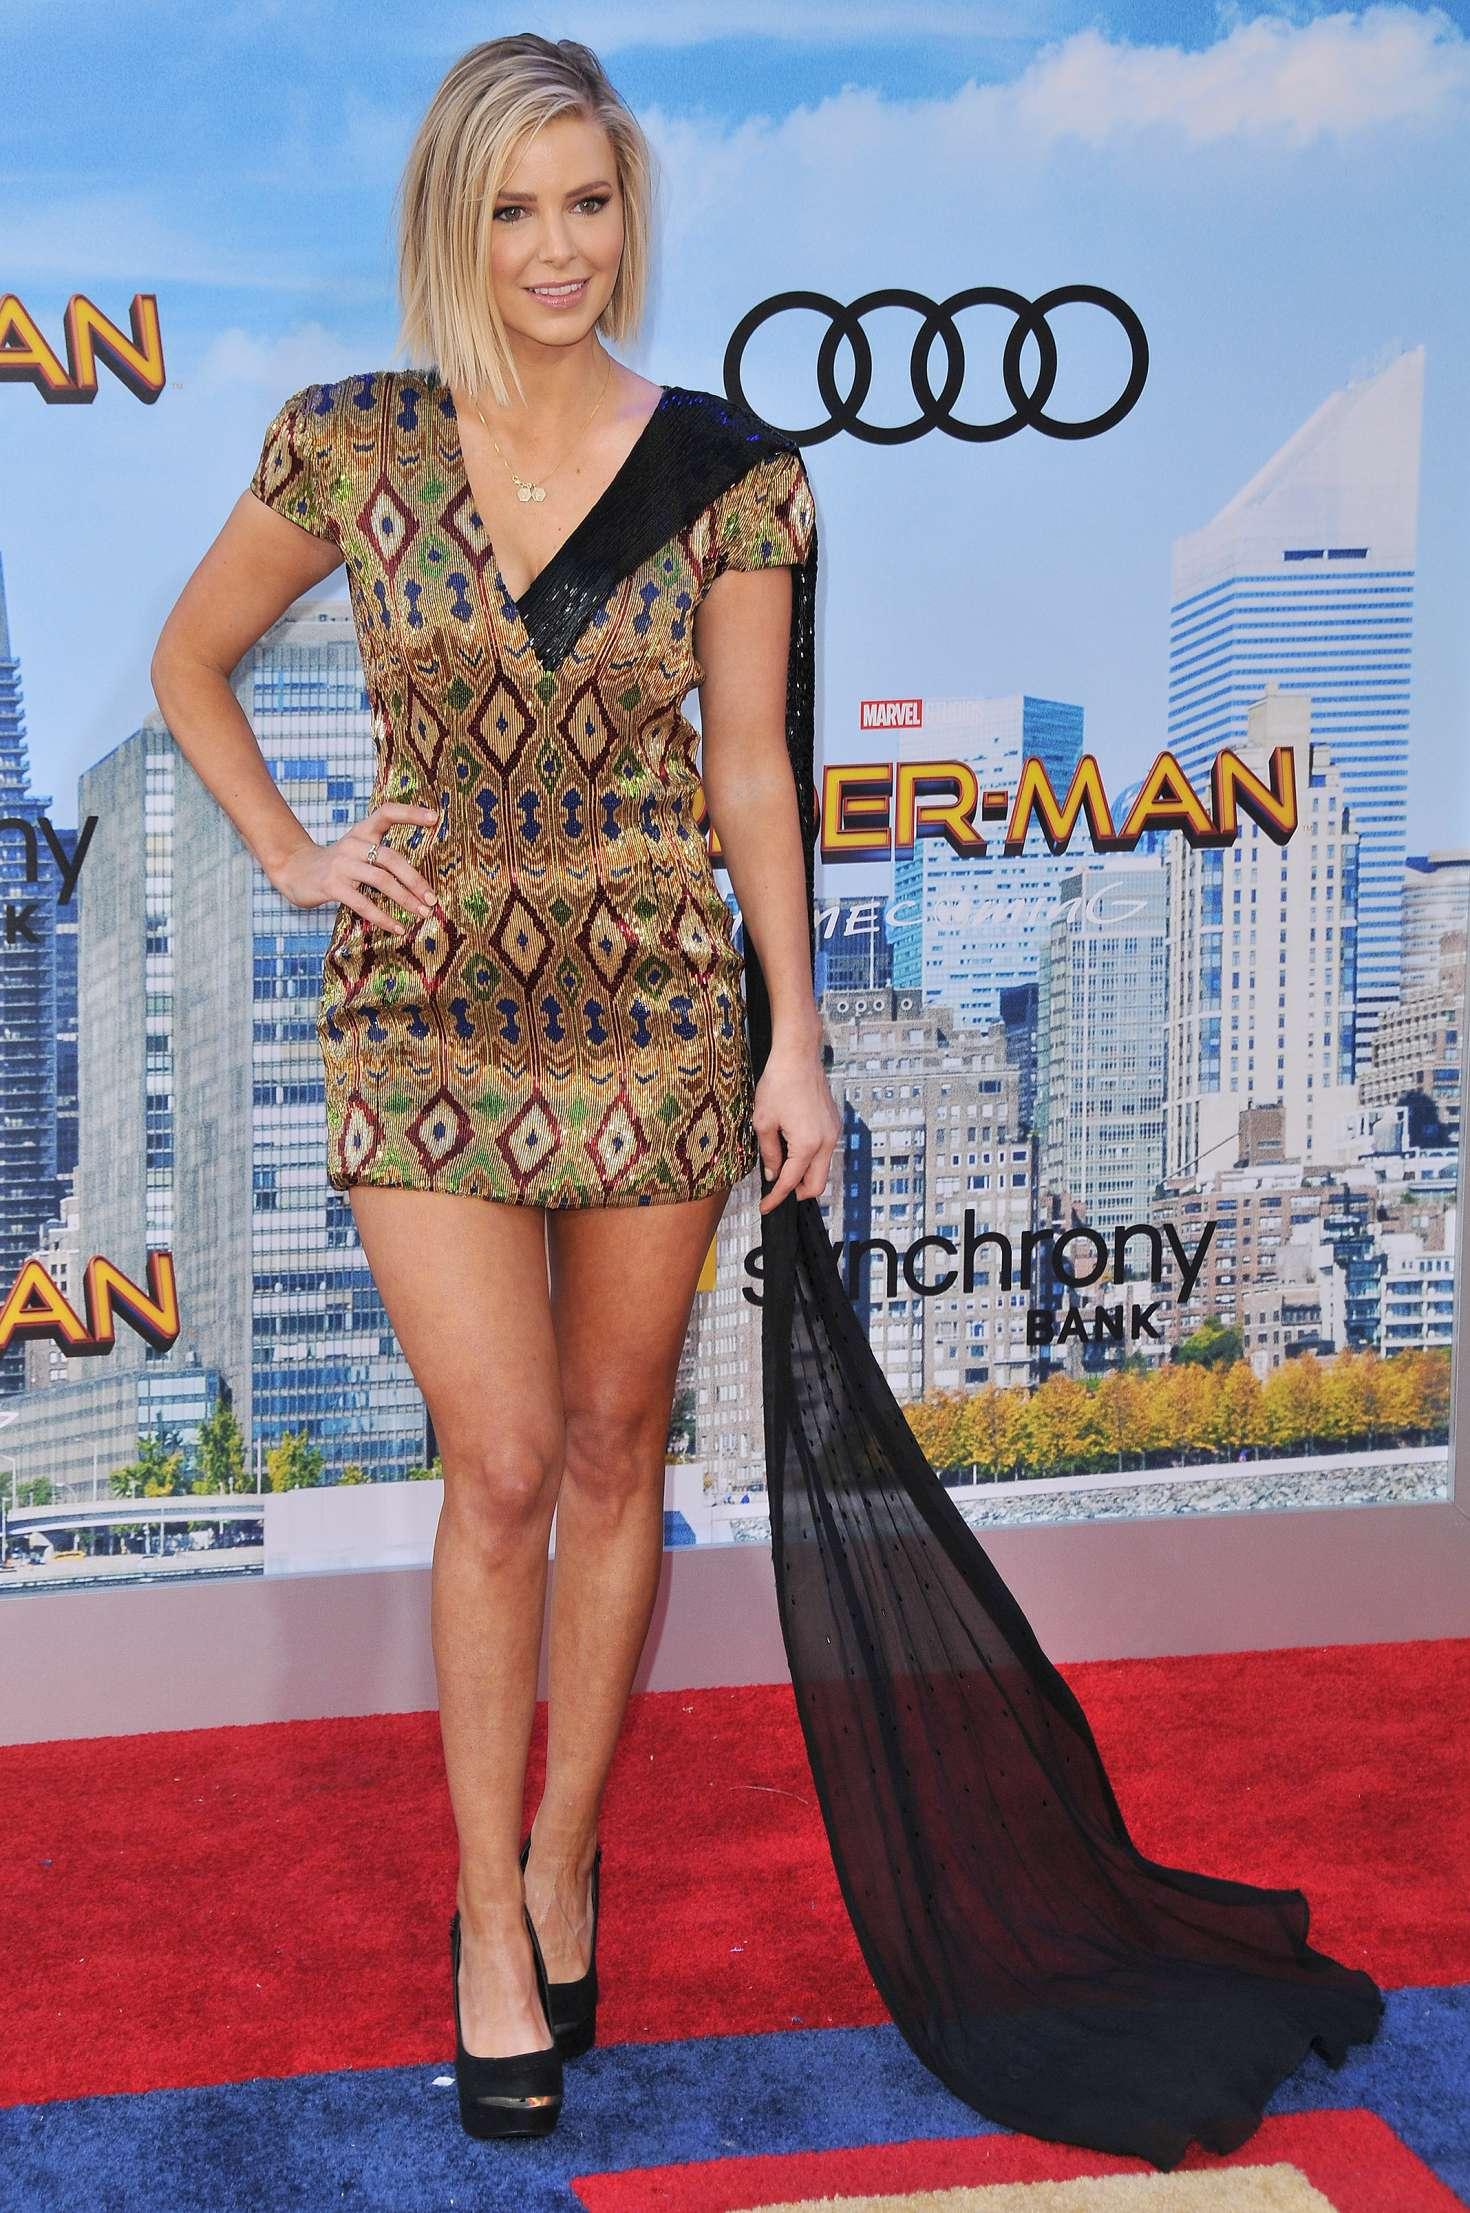 Ariana Madix 2017 : Ariana Madix: Spider-Man: Homecoming Premiere in Hollywood -02